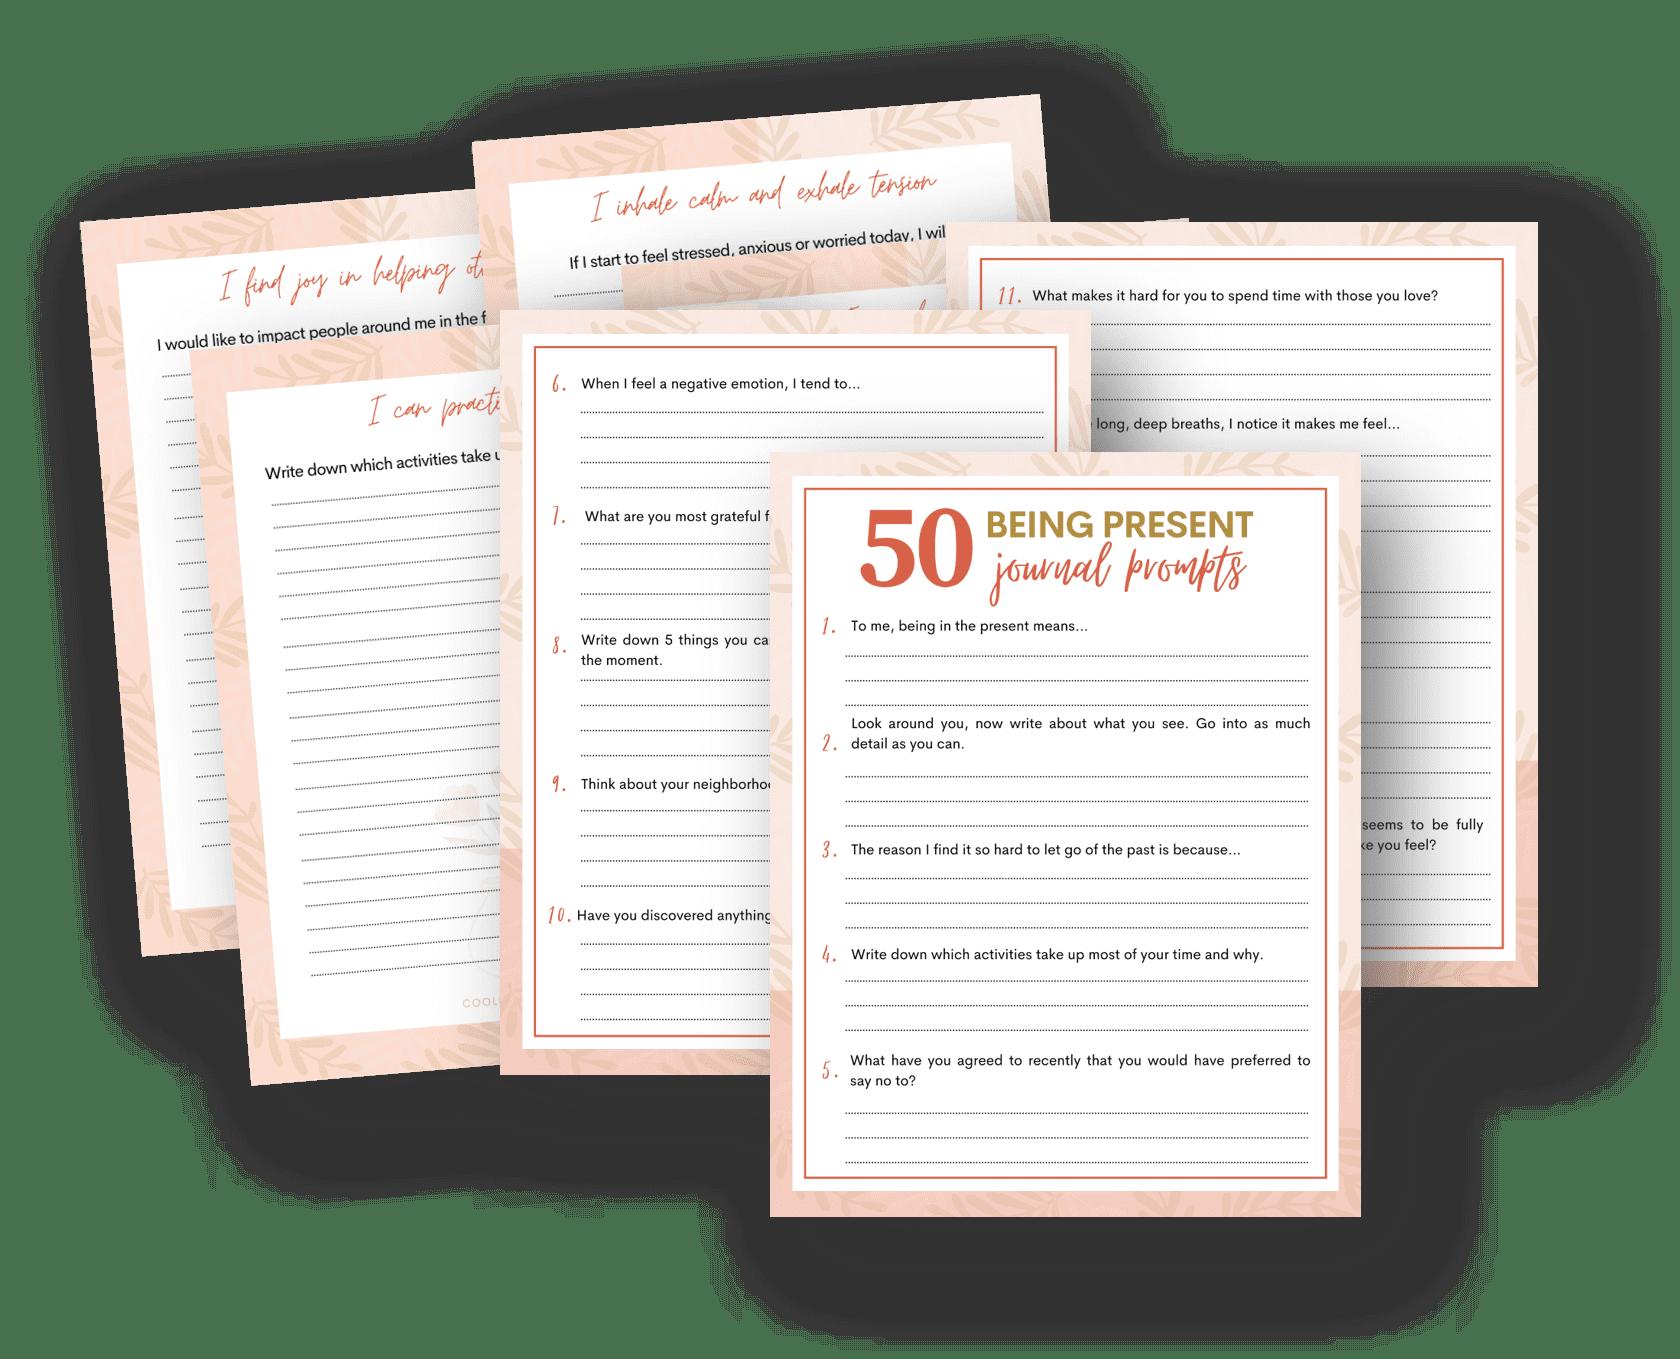 digital mindfulness journal prompts